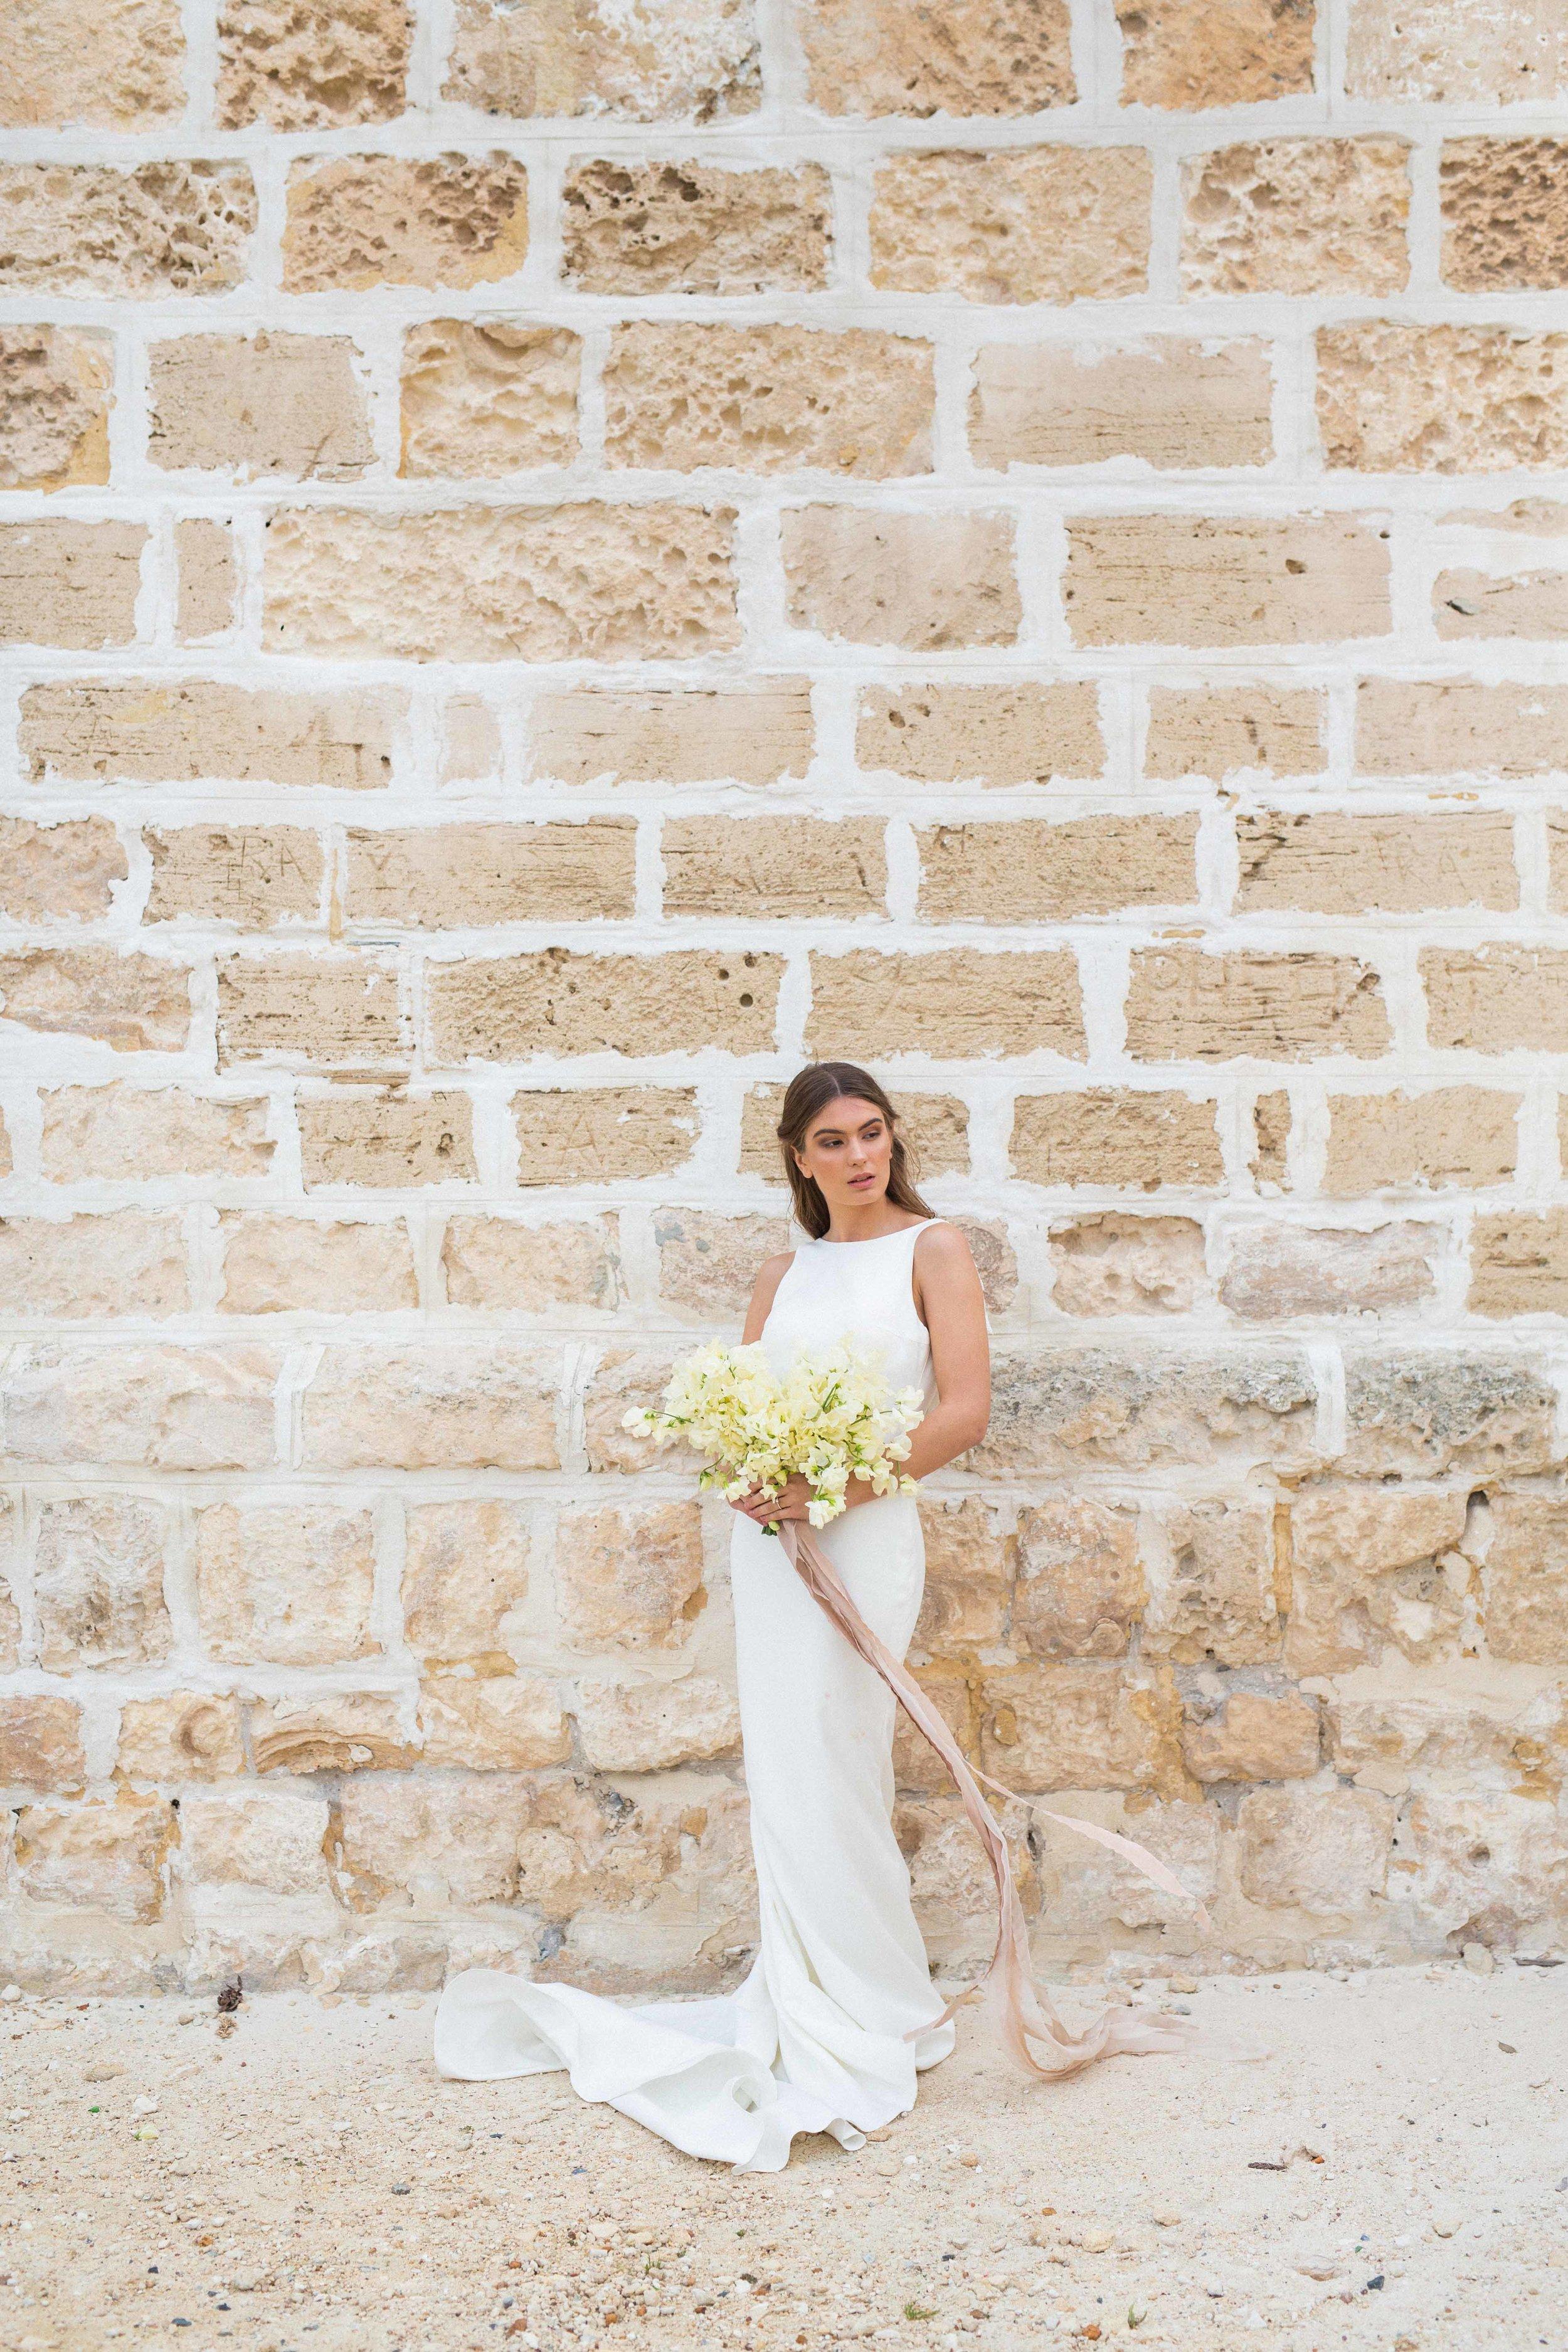 Fremantle Wedding Walk - Blue HQ, Perth Wedding Venue -  Tessa Kit Photography -JQ9A9190.jpg